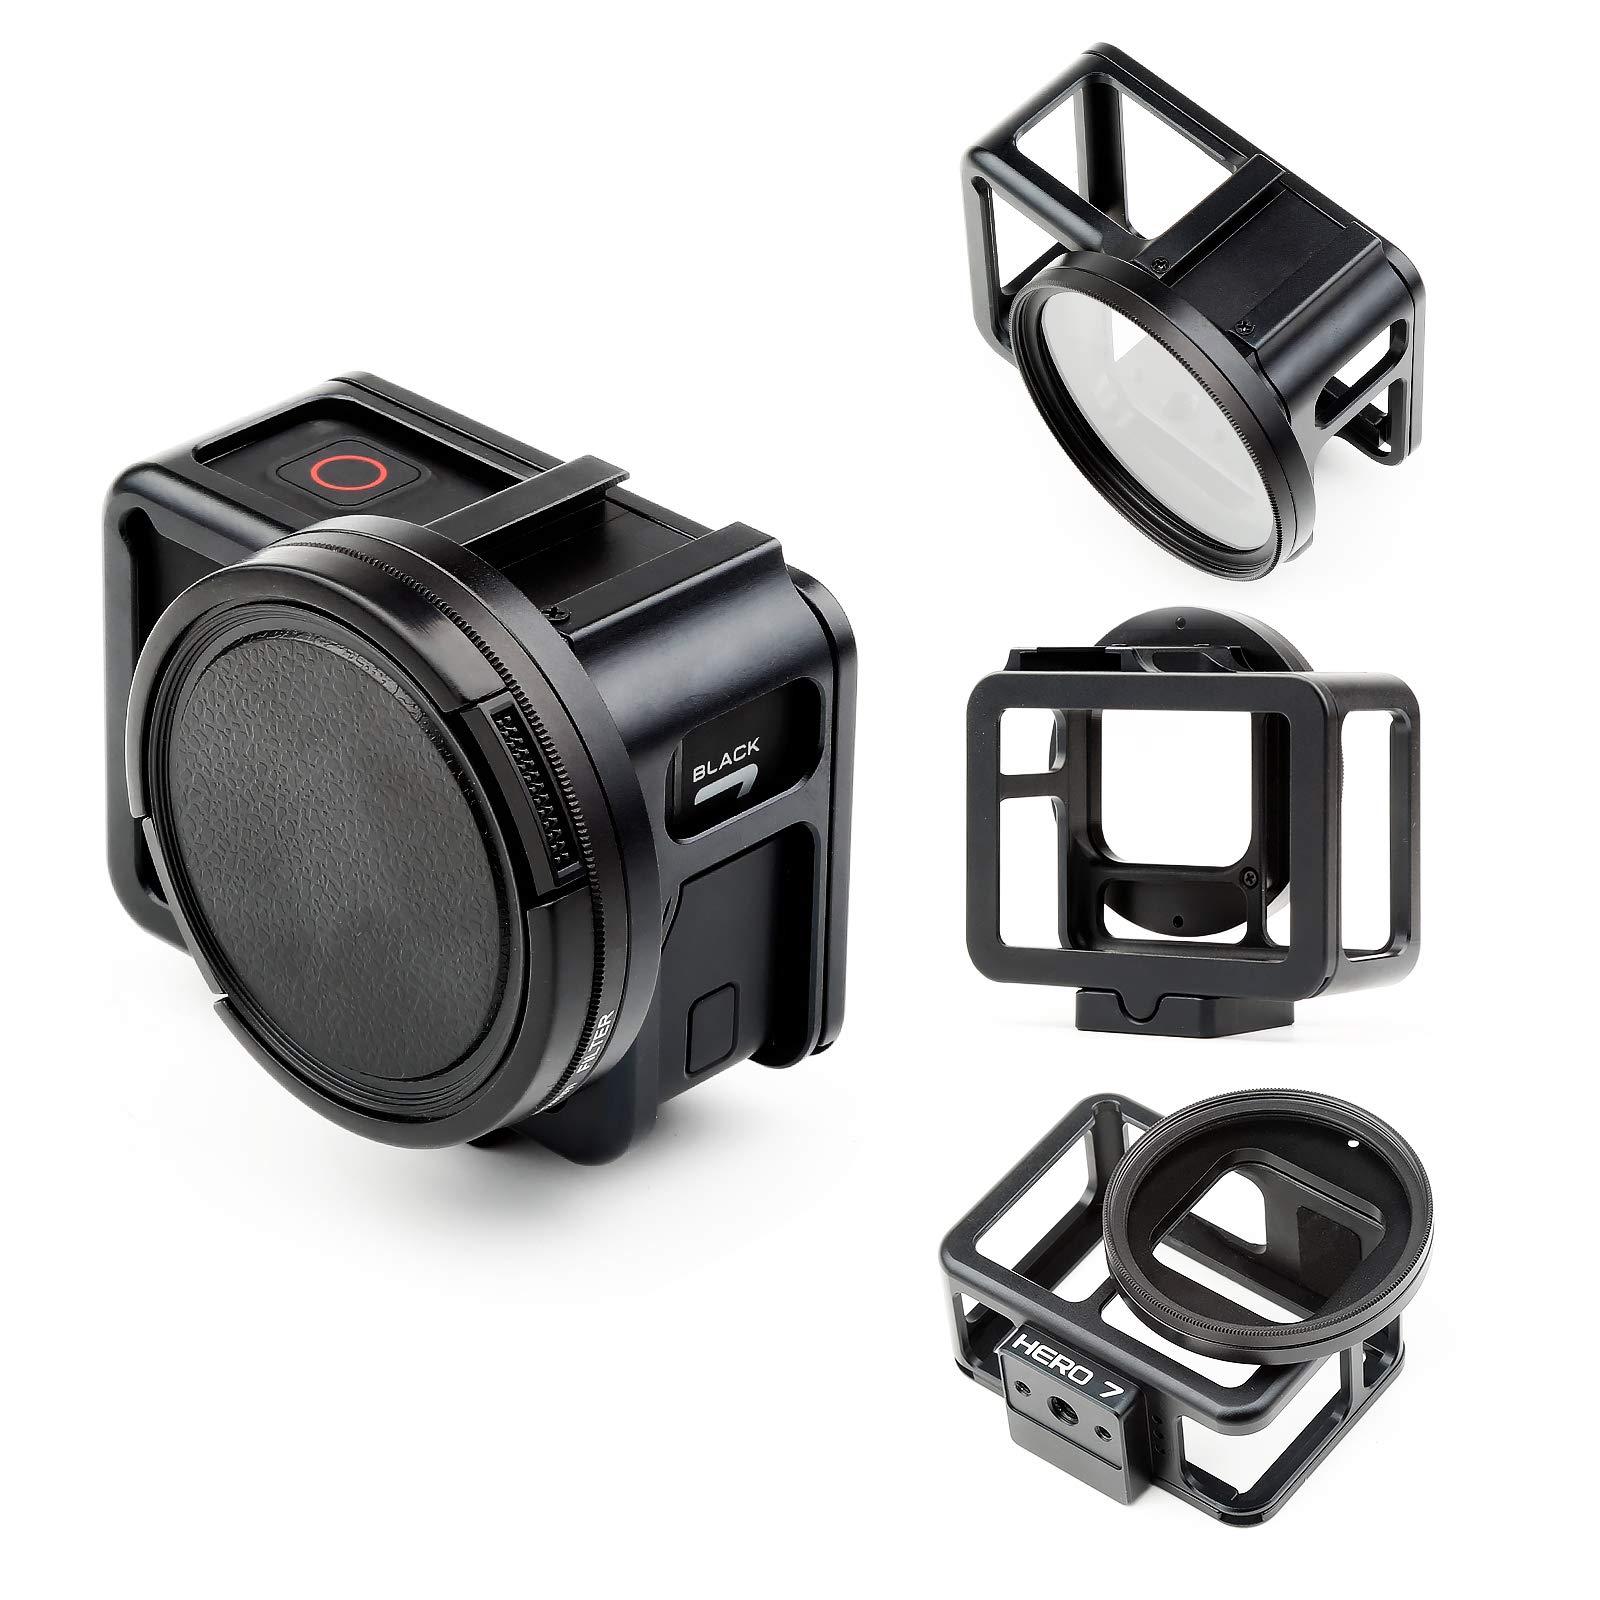 SHOOT Aluminum Solid GPS Vlogging Cooling Case Frame for HERO7 Black/Hero(2018) Built-in 52mm UV Protection Lens Filter,Lens Cap,Mic Cold Shoe Adapter,Receive GPS,WiFi Signal